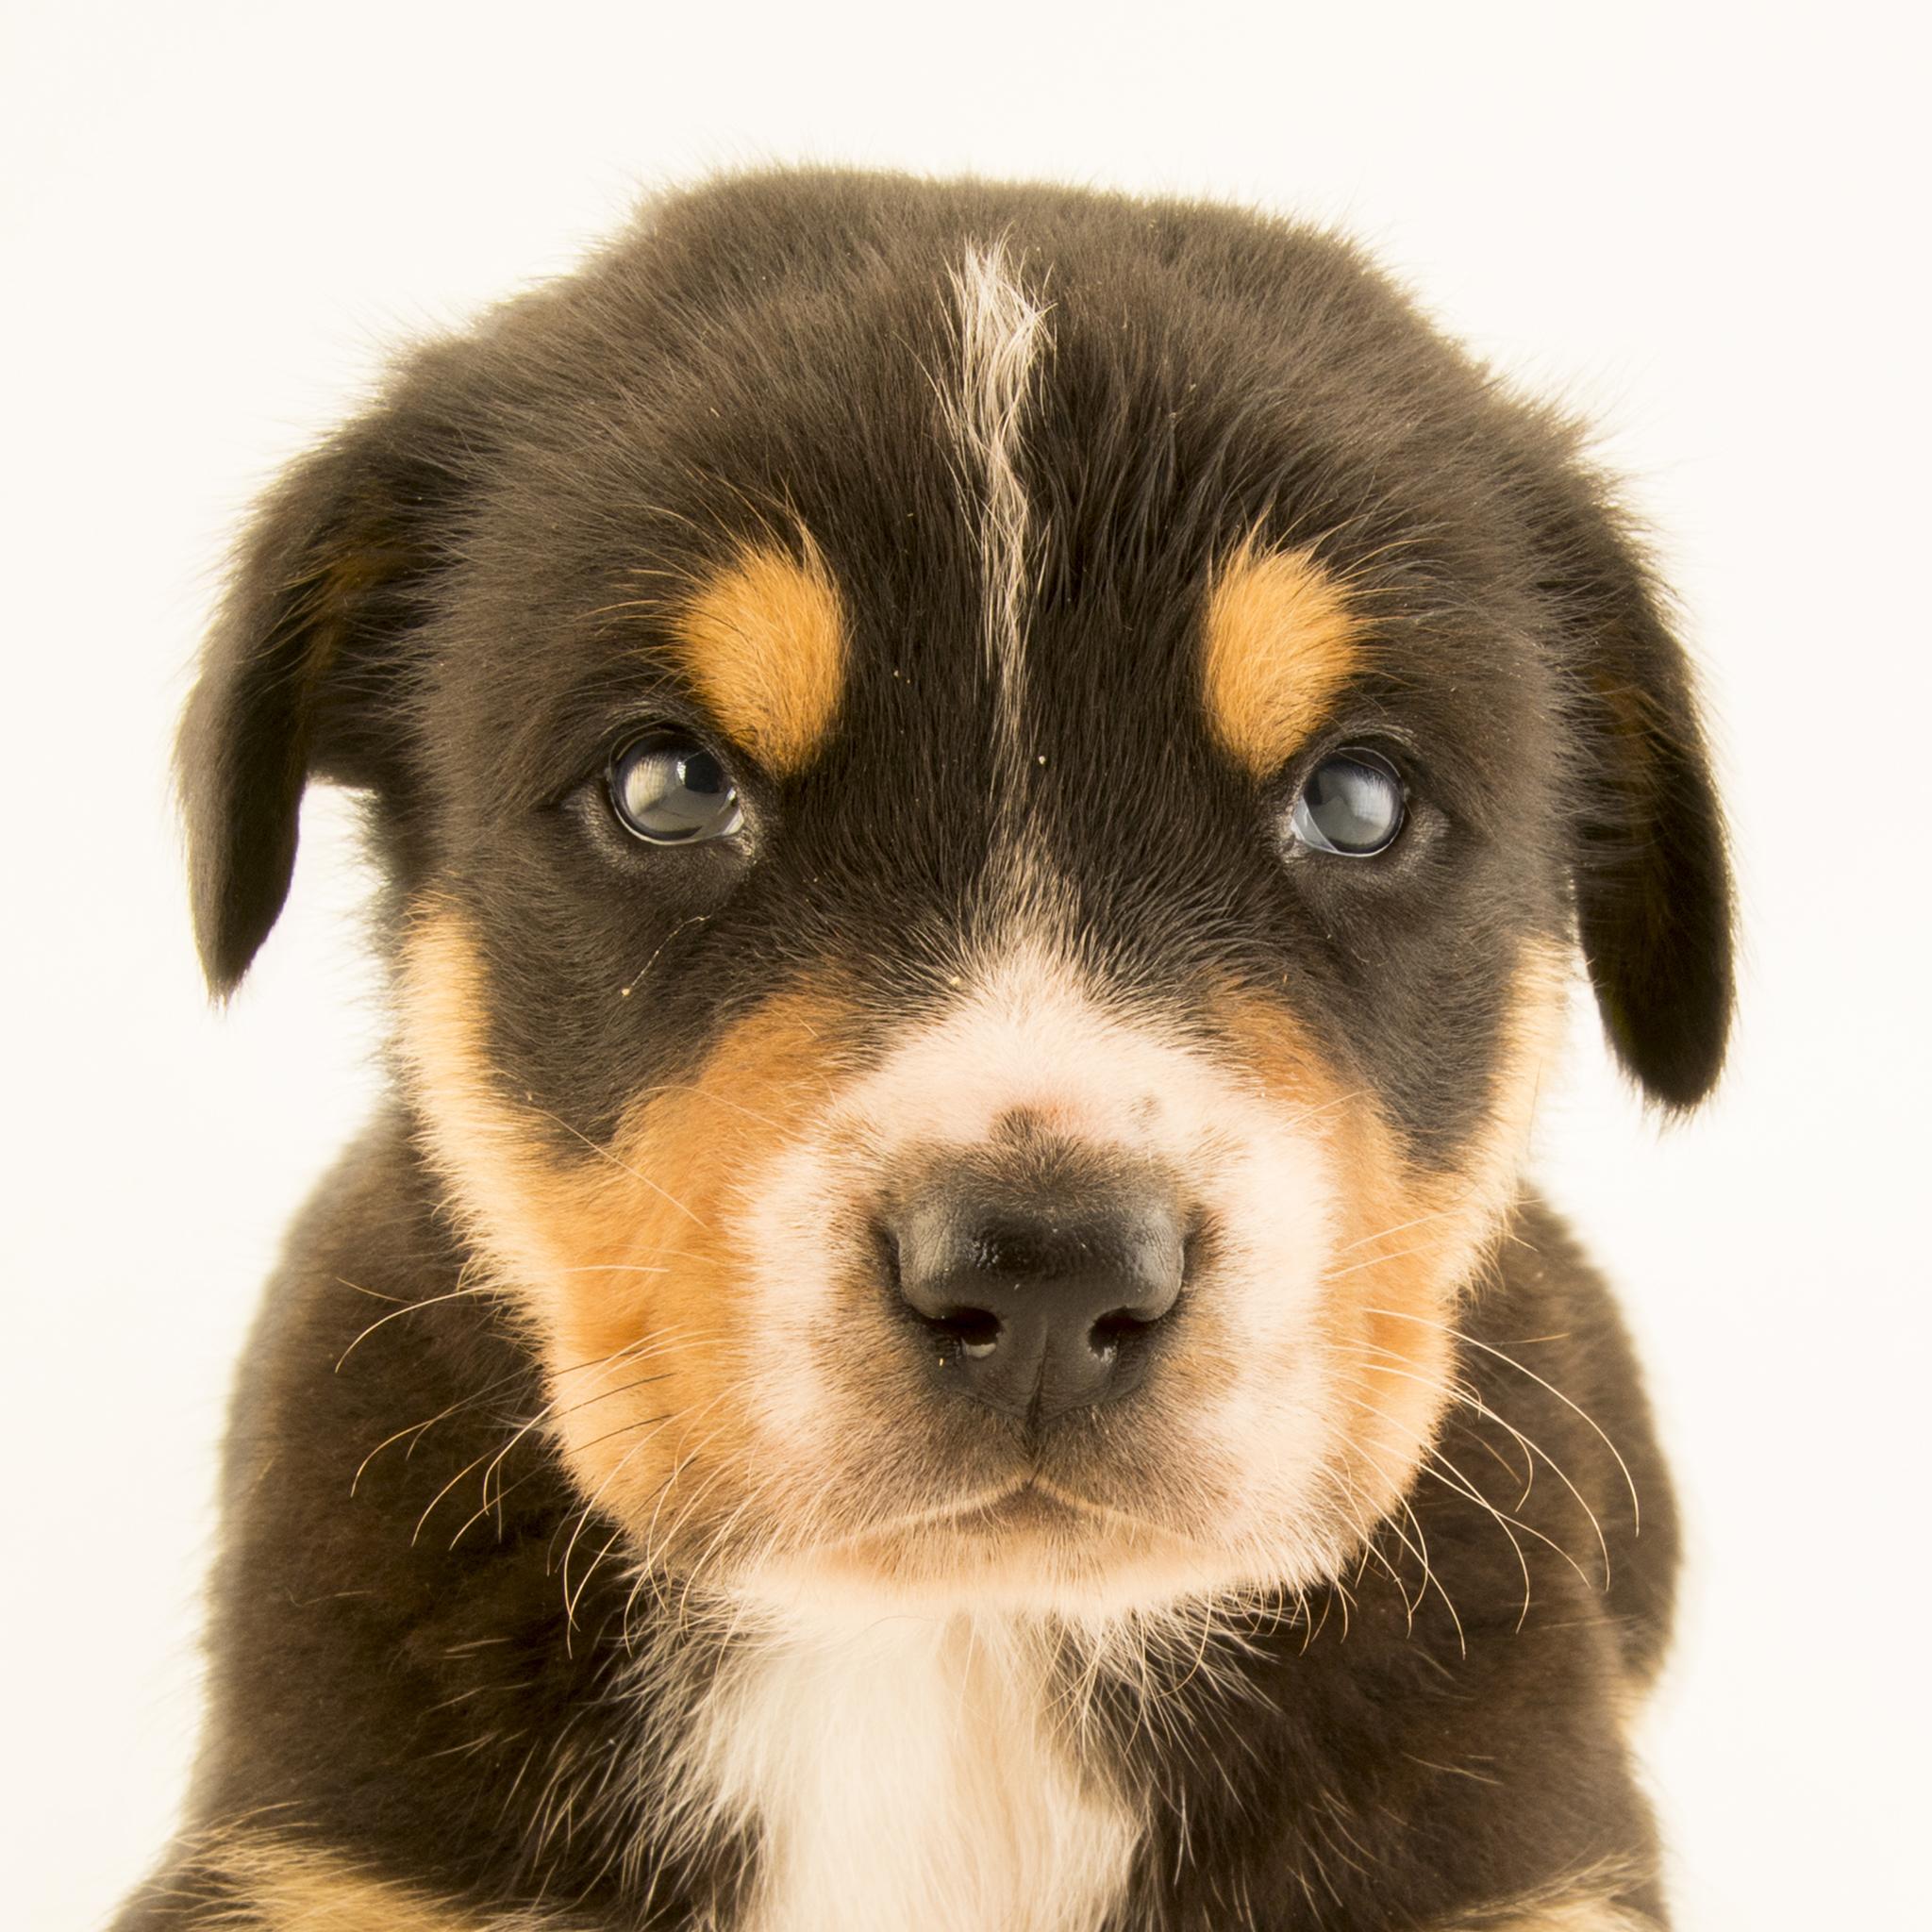 Dog | National Geographic